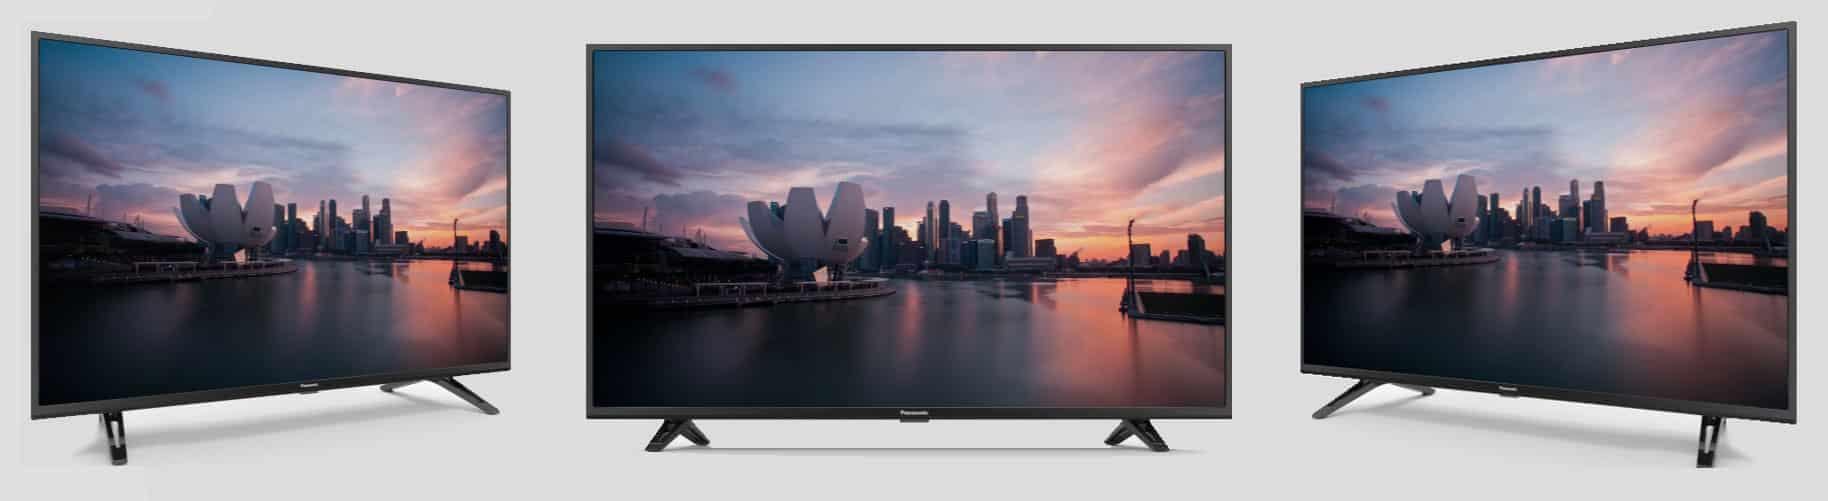 Toshiba-Android-TV-43L5995VJ